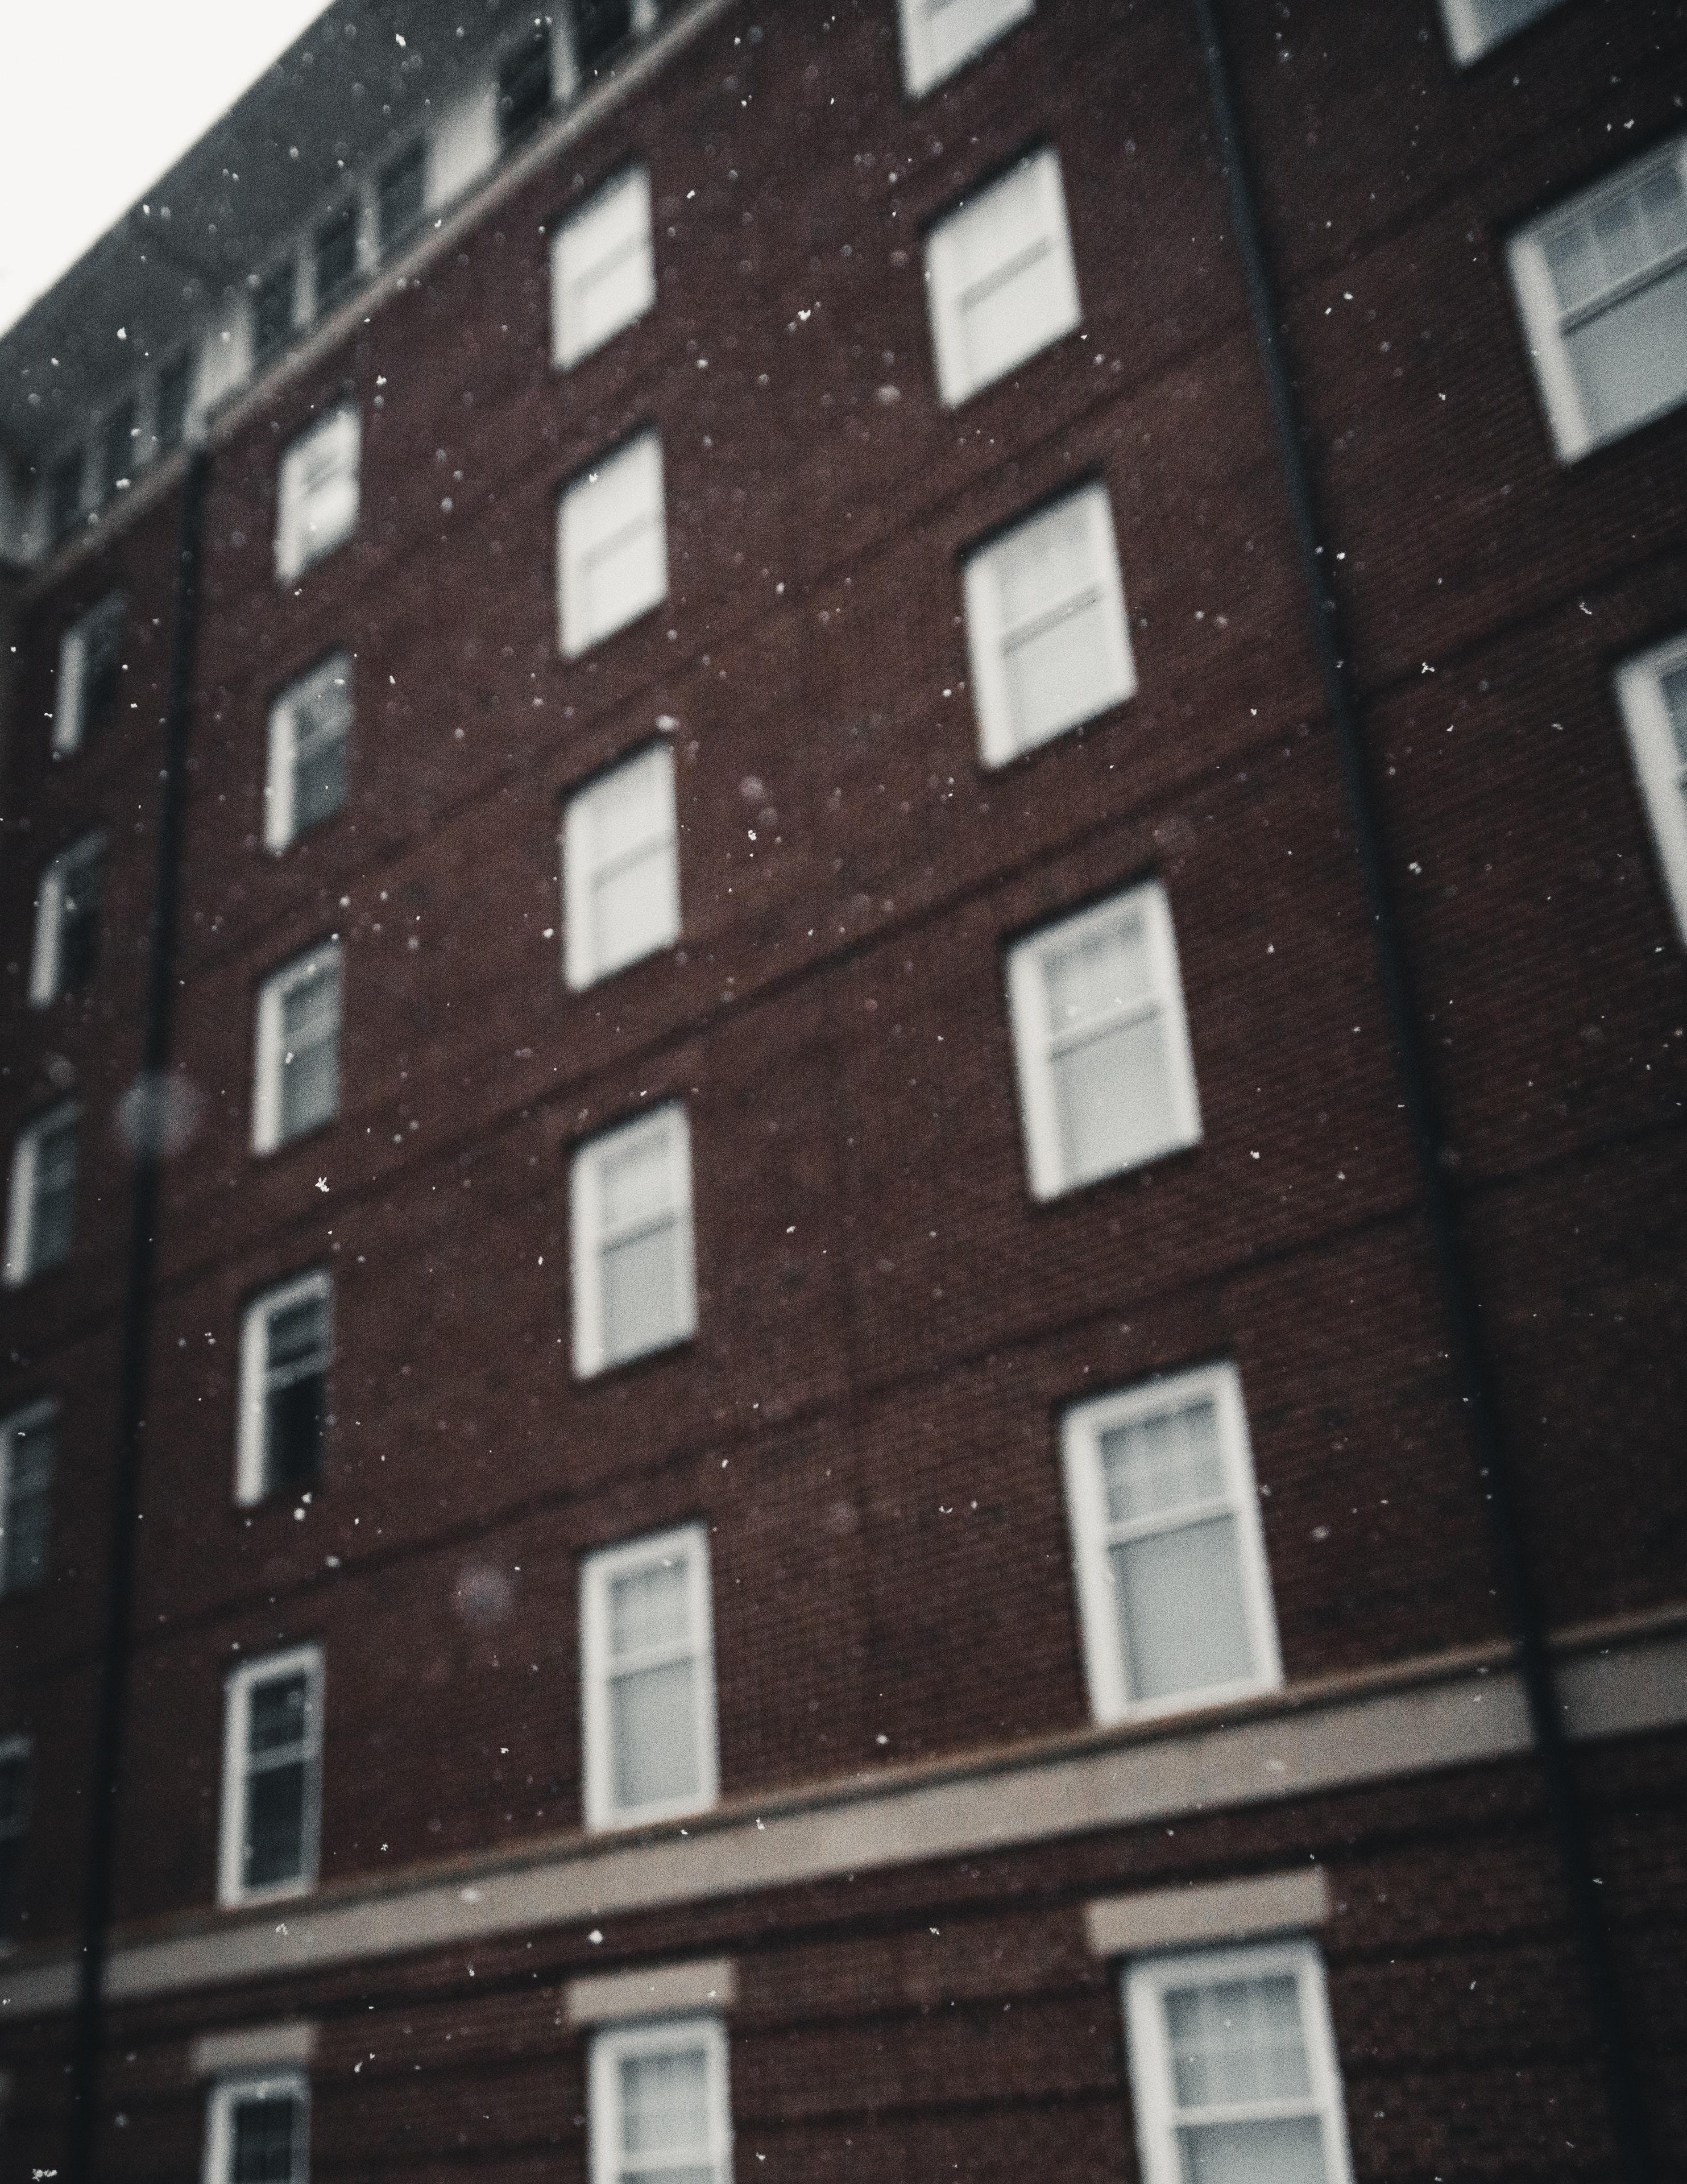 Brown and white concrete building photo